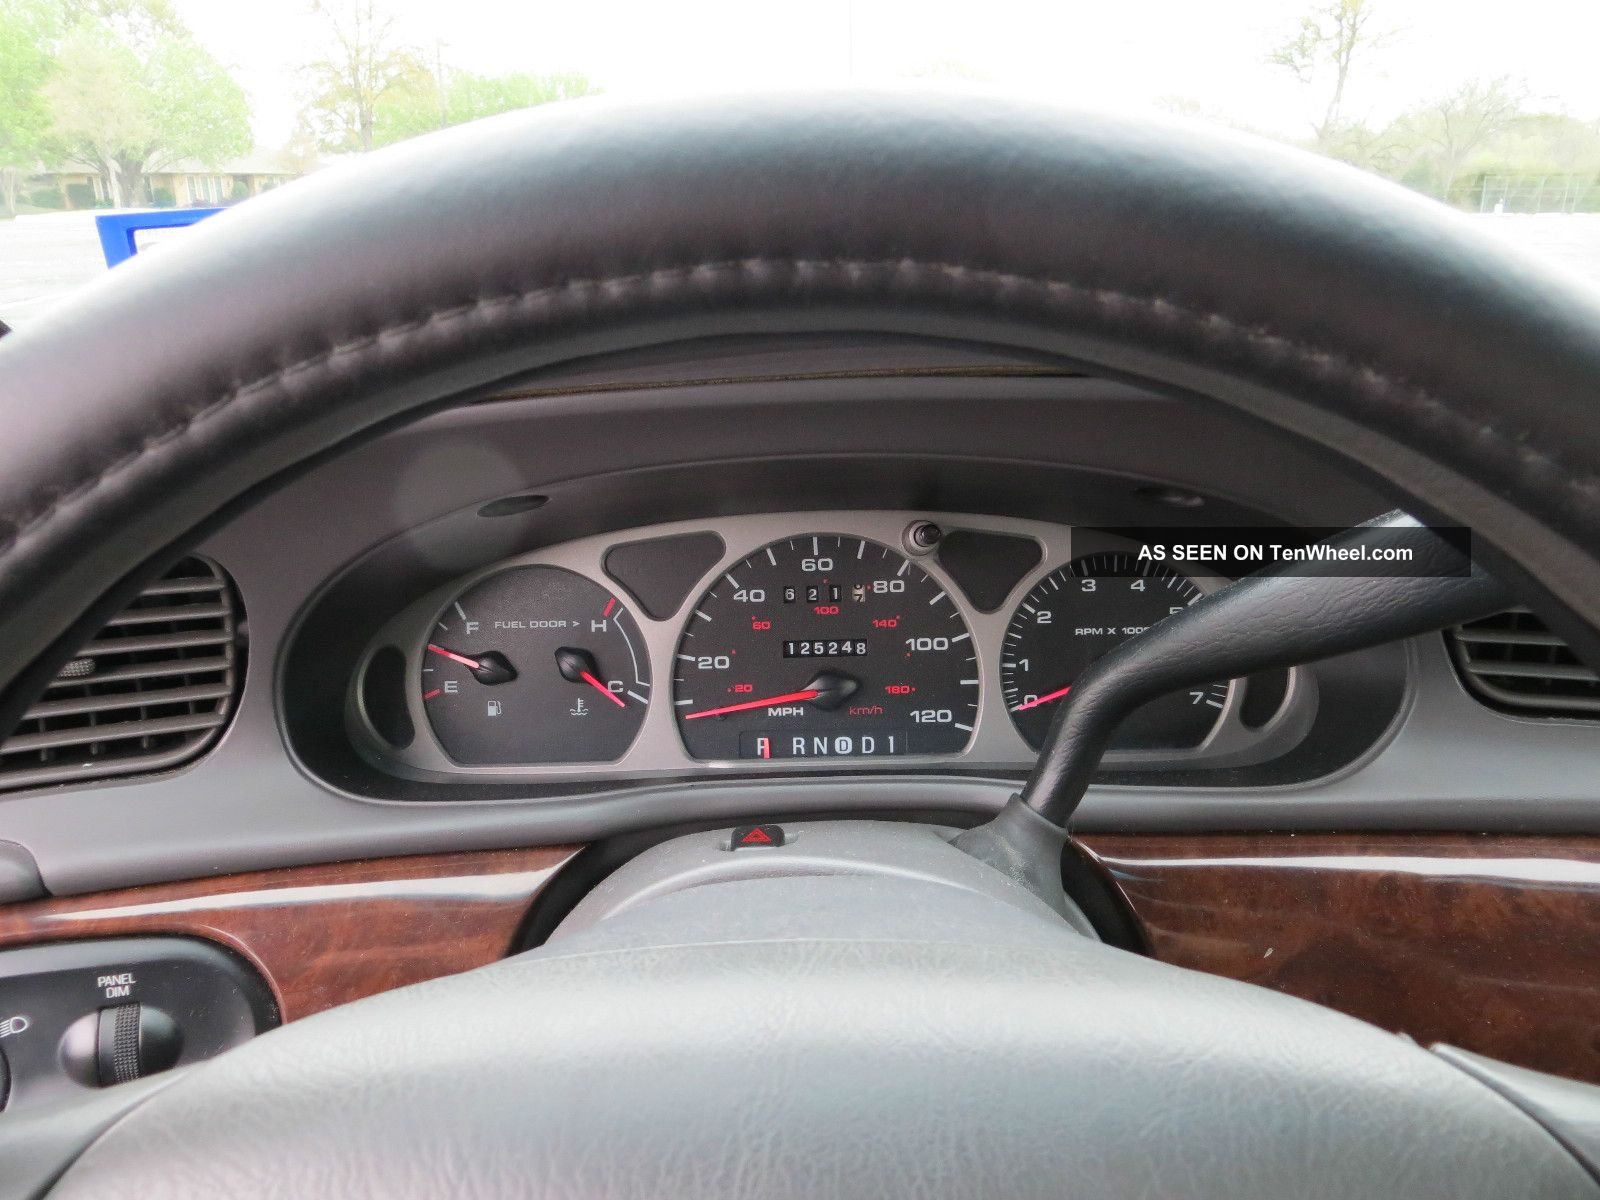 1999 Mercury Sable Gs Sedan 4 Door 3 0l